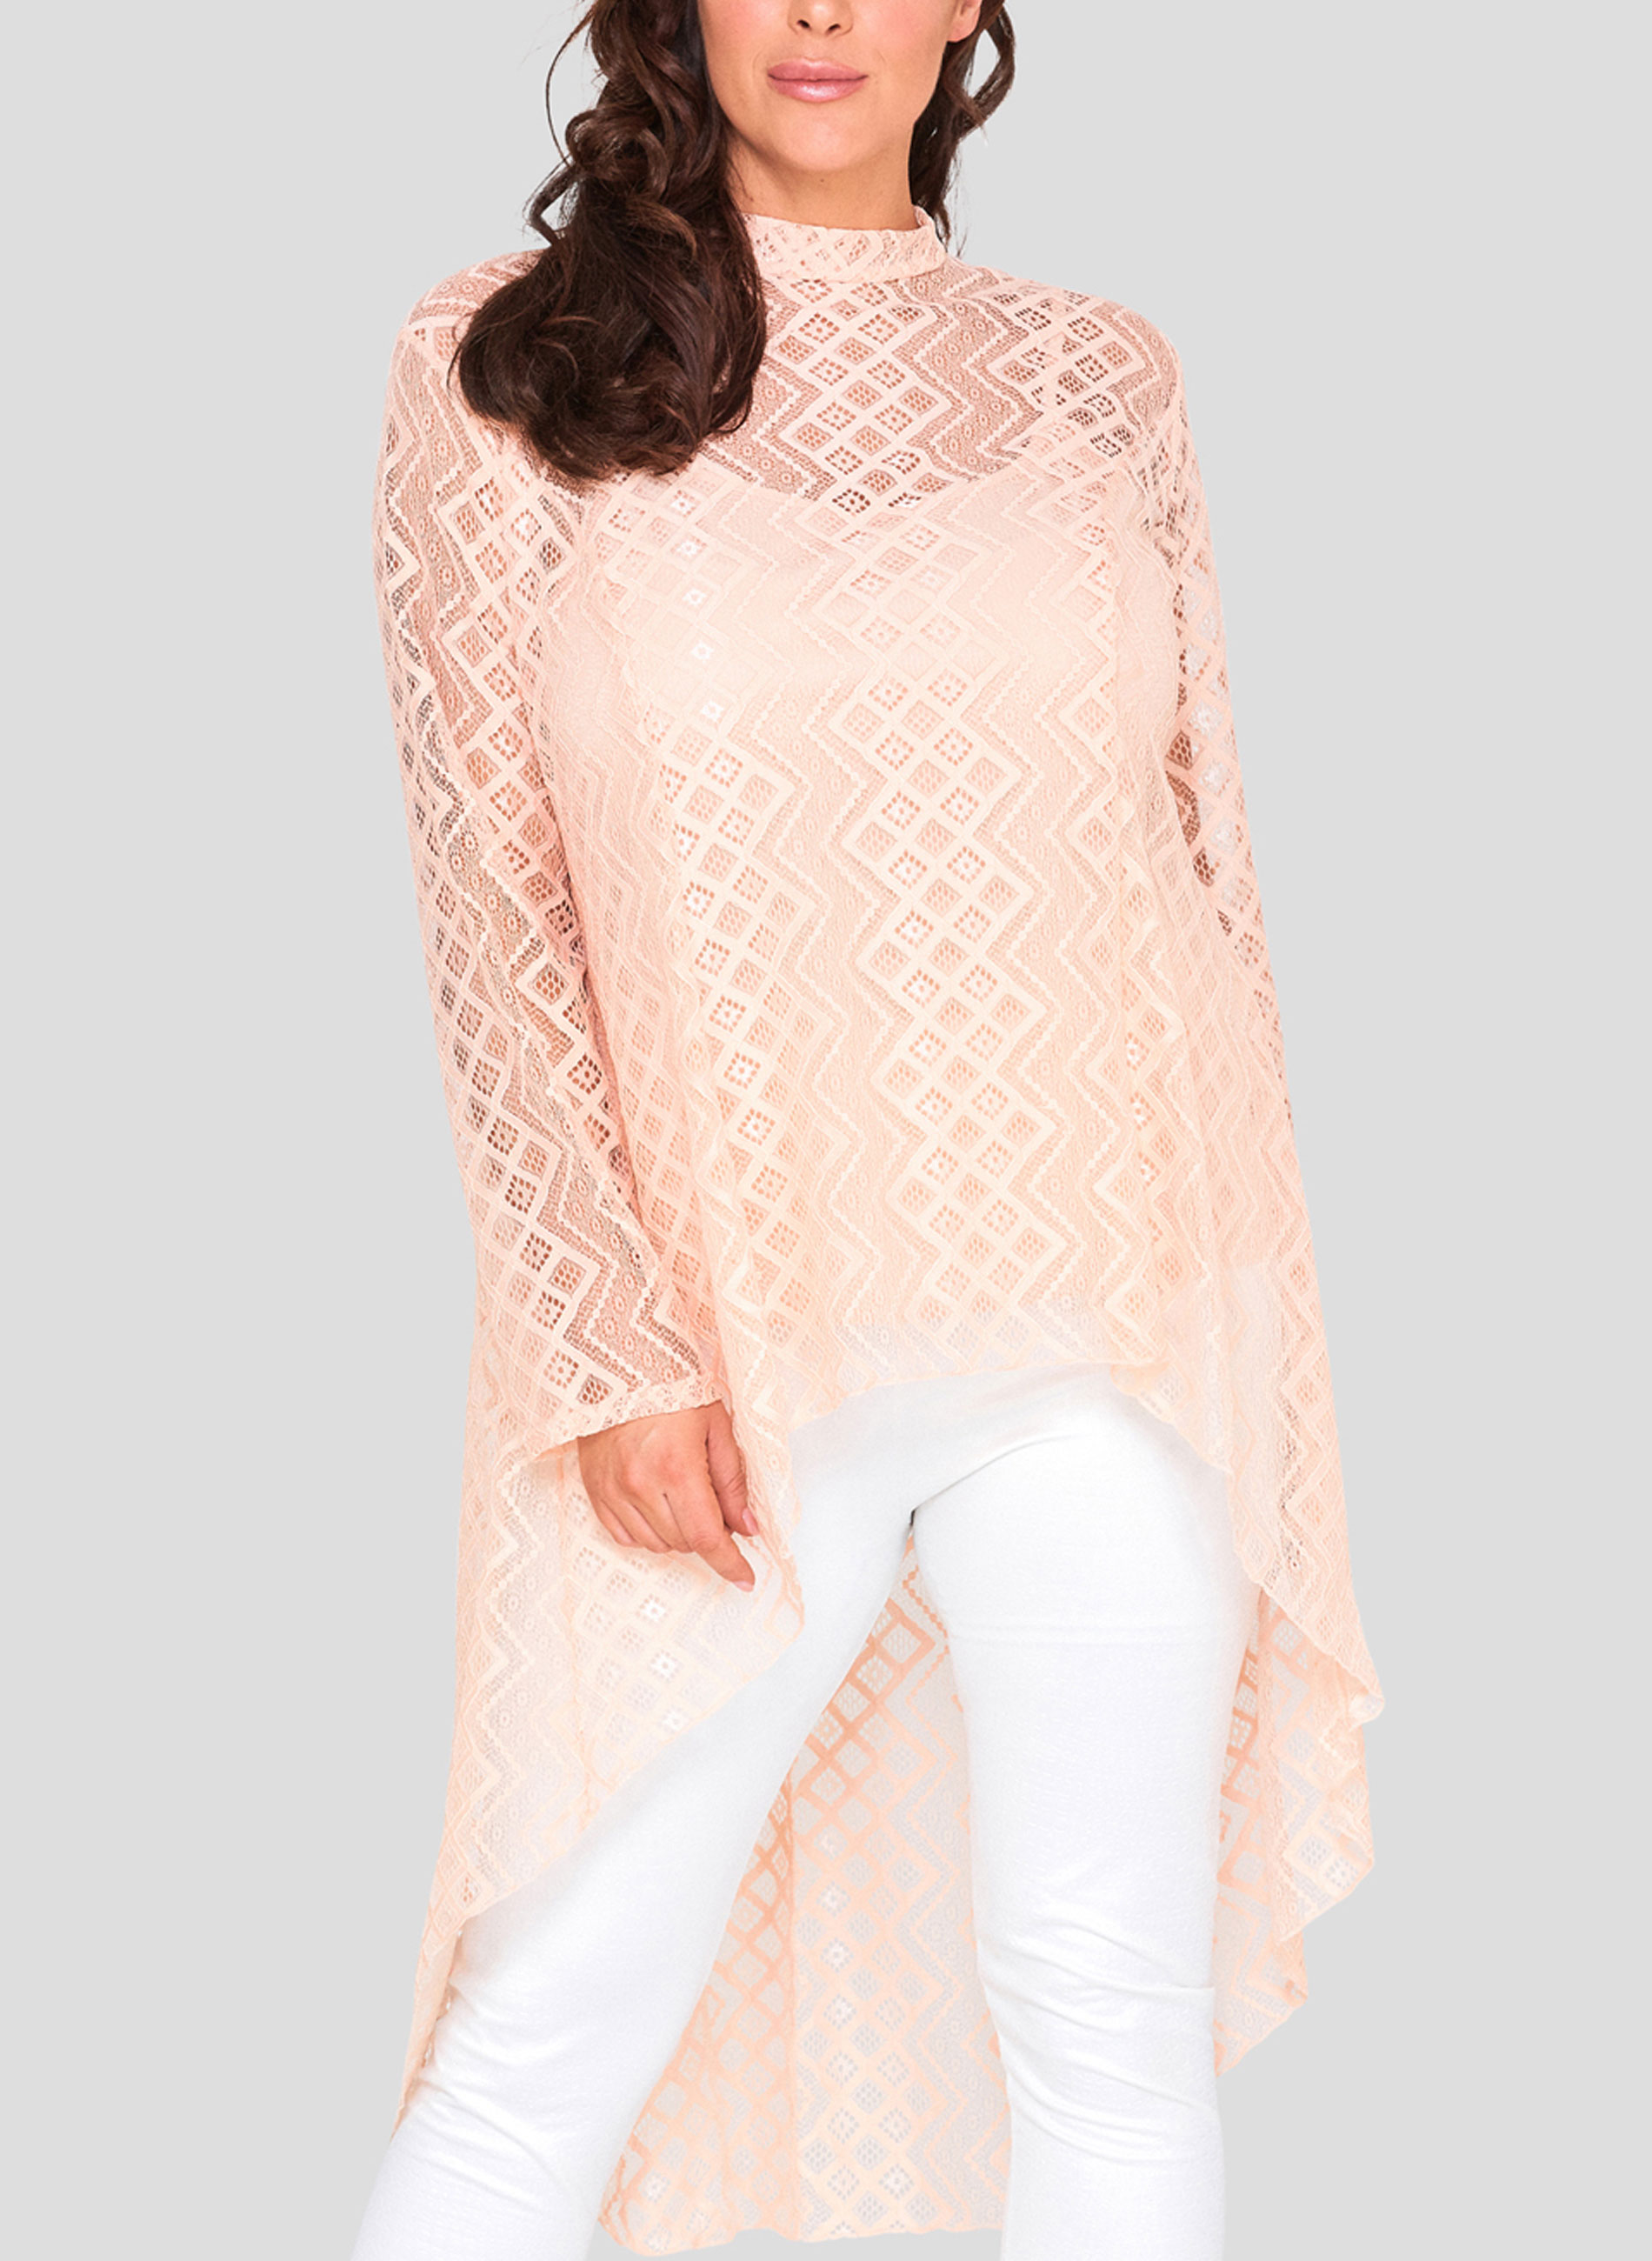 e4dcec646f6 SizePlusOnly | Γυναικεία Ρούχα Μεγάλα Μεγέθη | Maniags | top ...